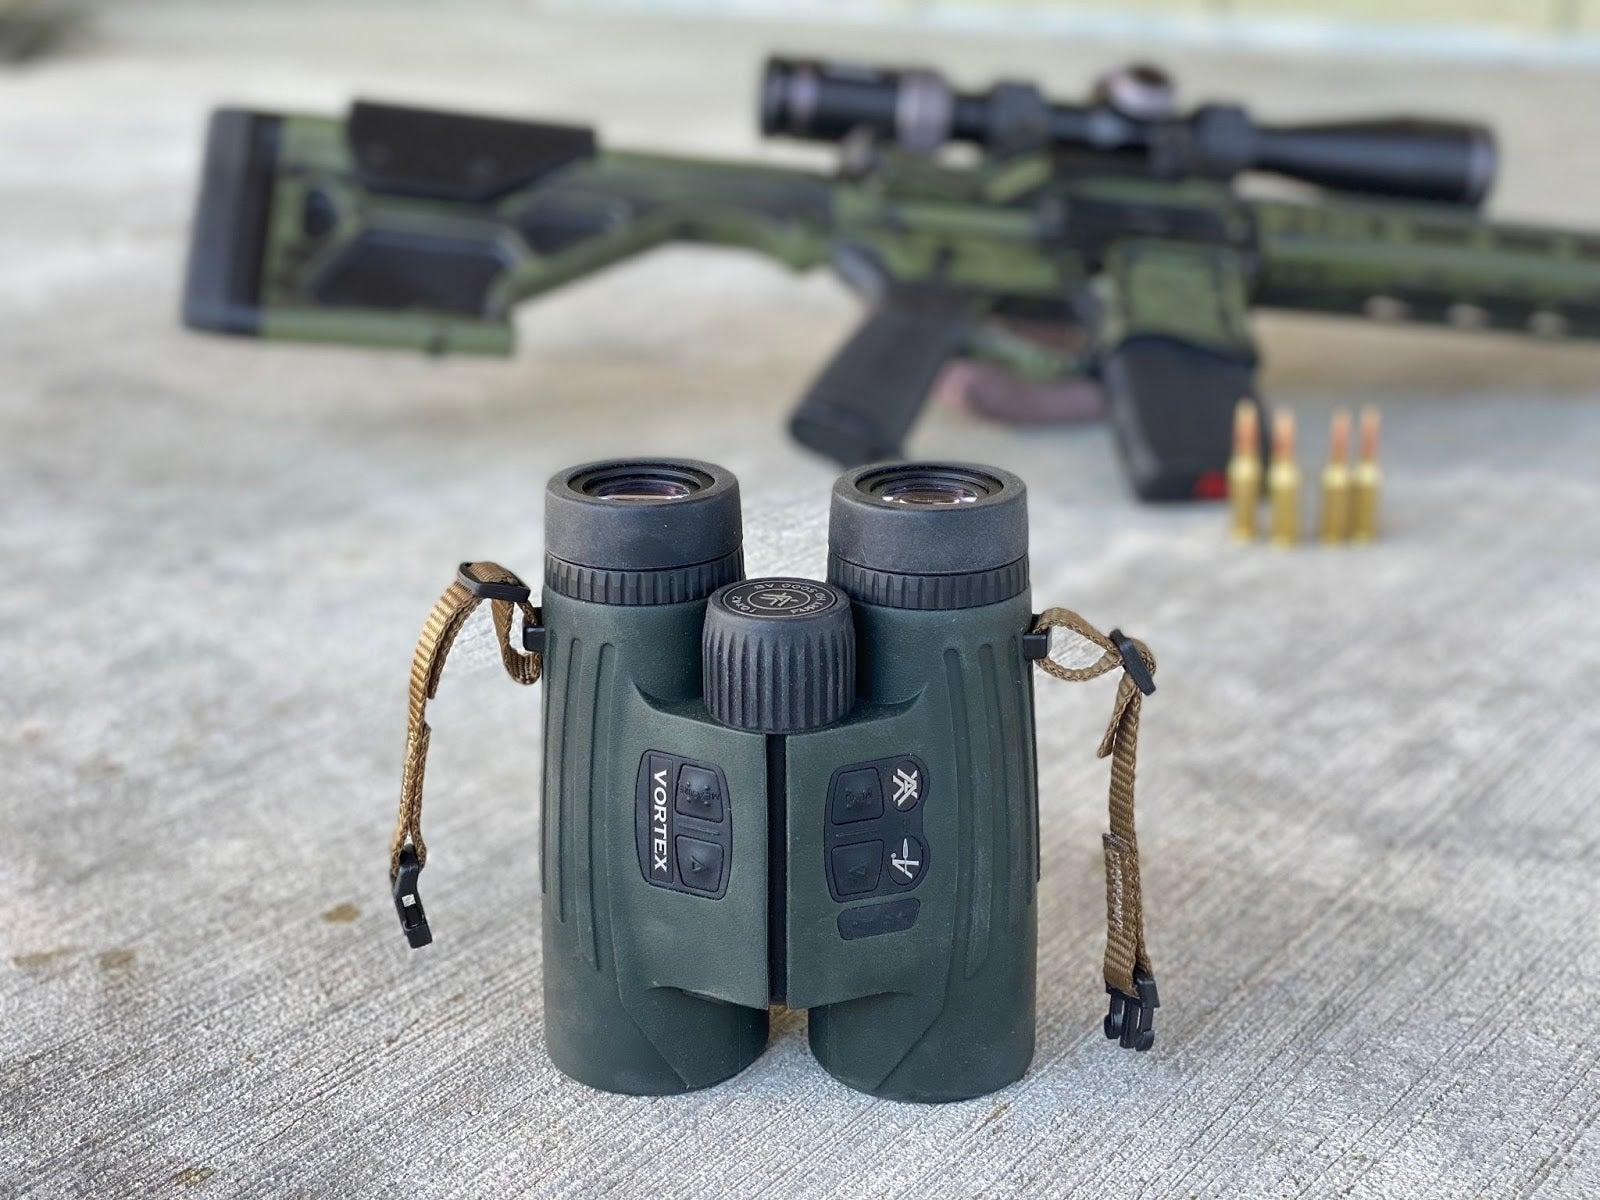 The Vortex Fury HD AB 5000 ranges, spots and calculates ballistics.